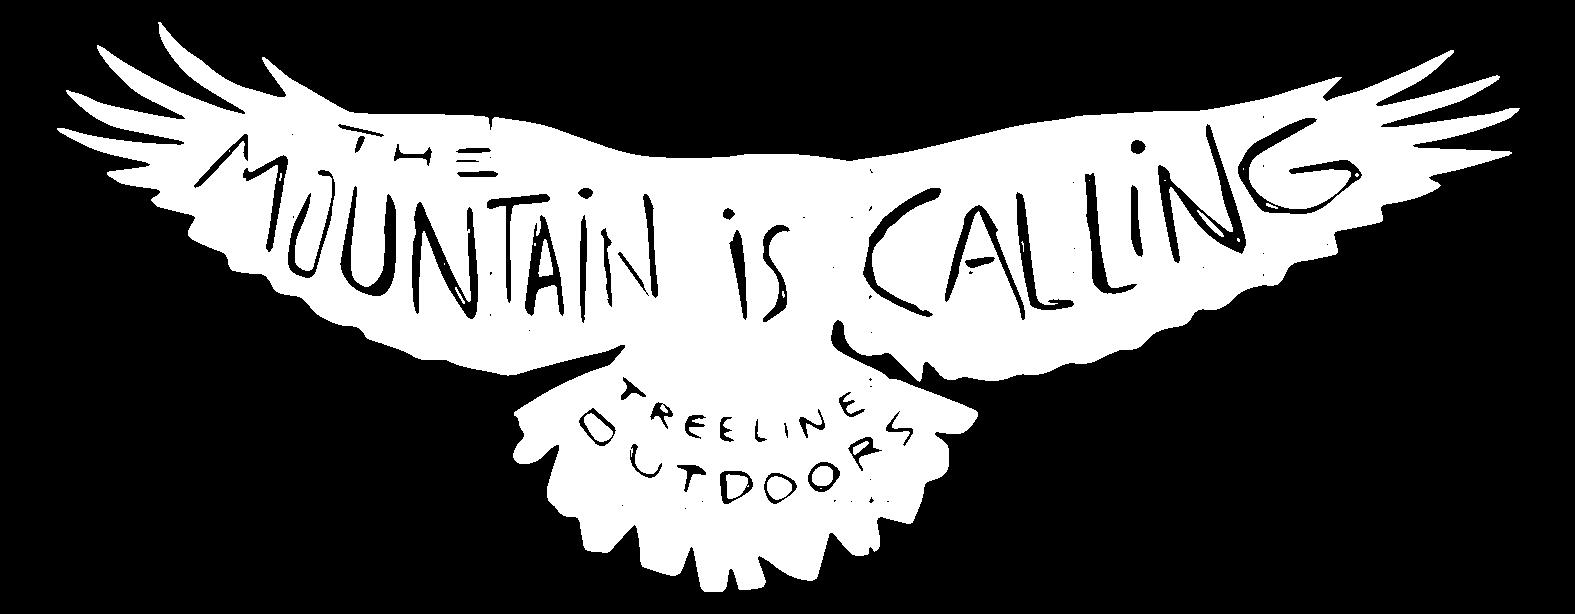 Branding by Hank White Co